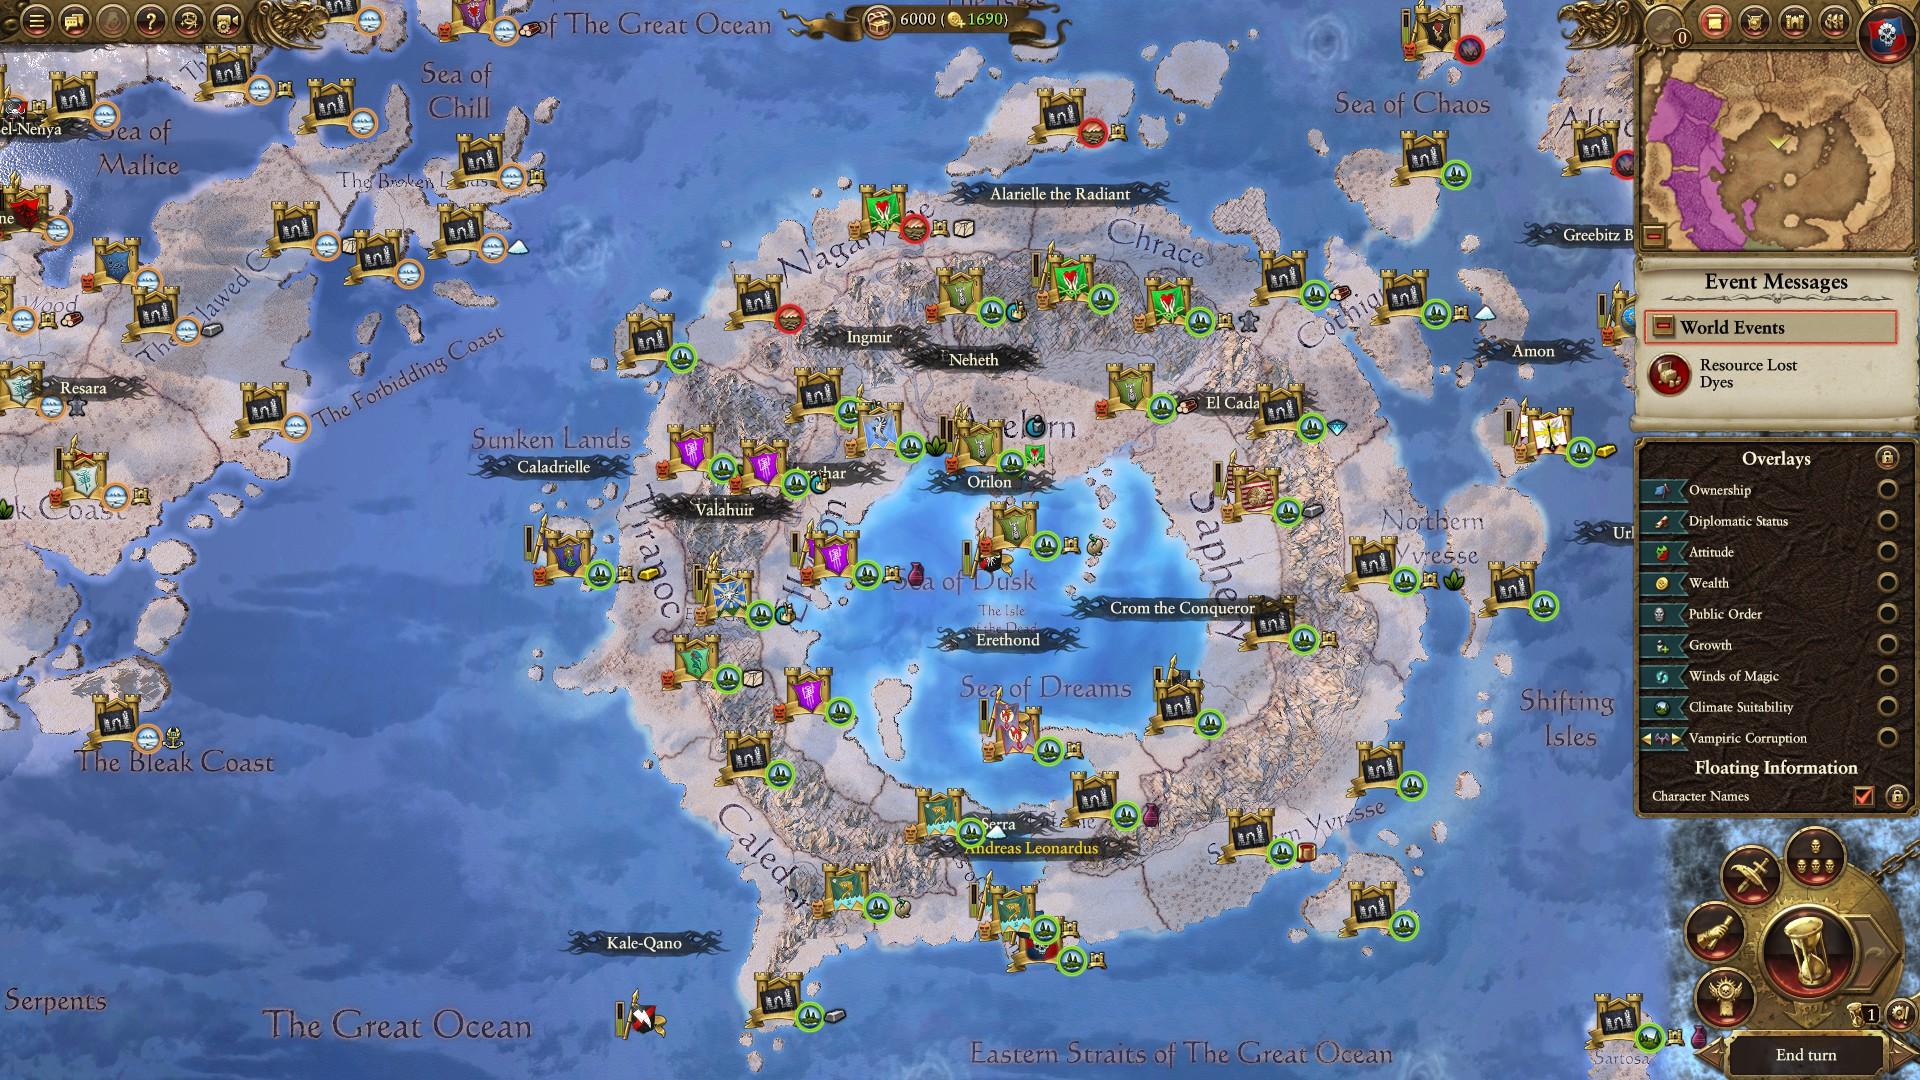 Steam Workshop :: Totally Random Total War Generator: Warhammer II